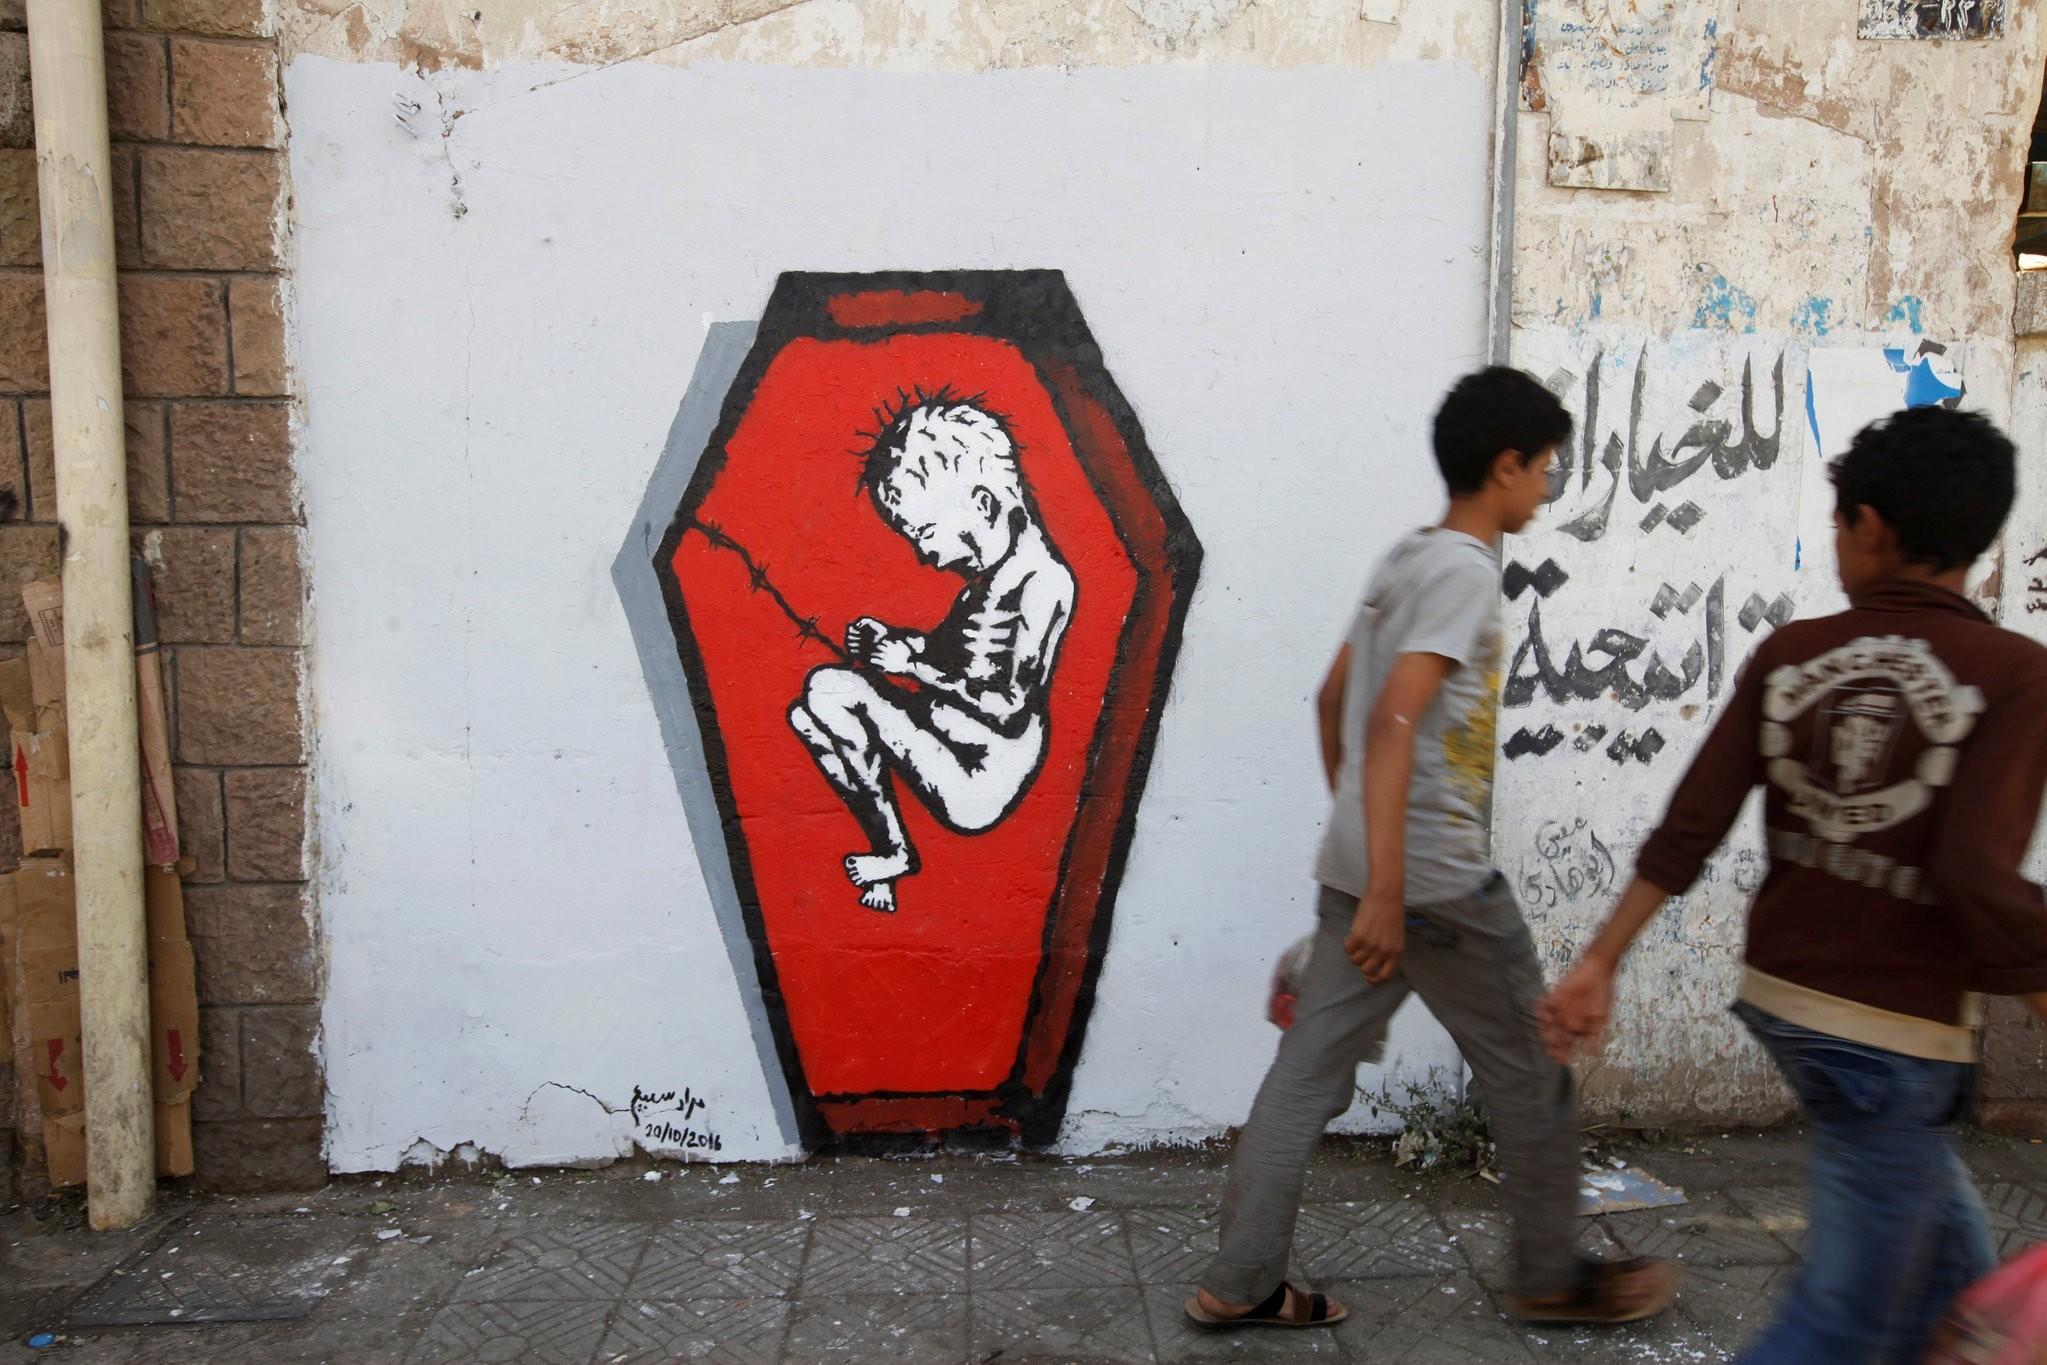 Boys walk pass a graffiti of artist Murad Subai depicting a child suffering from malnutrition in a coffin along a street in Sanaa, Yemen, October 20, 2016. (REUTERS Photo)